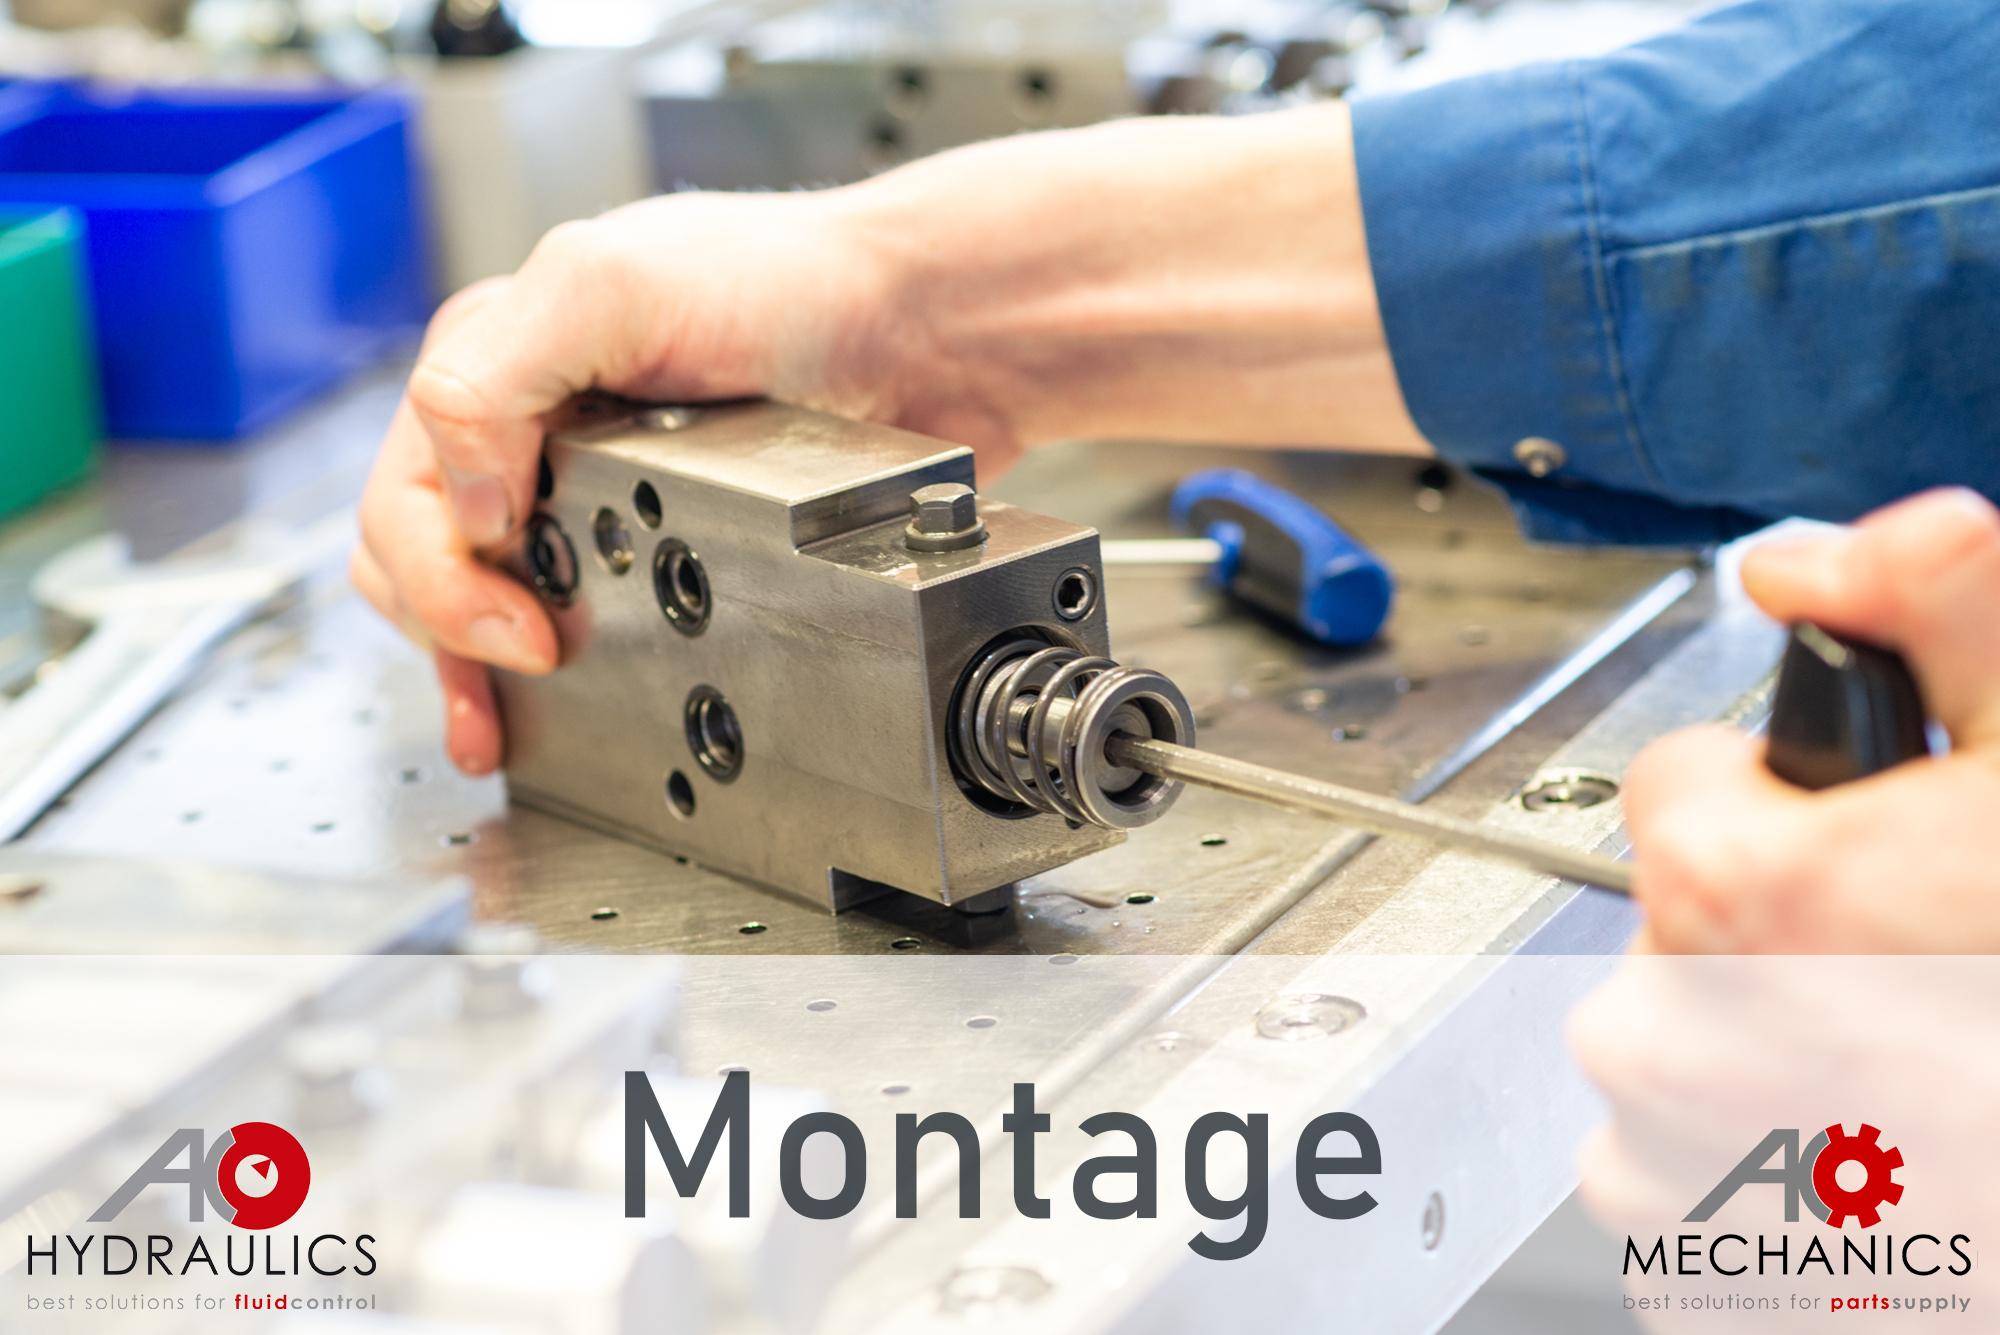 Montage – AK Regeltechnik